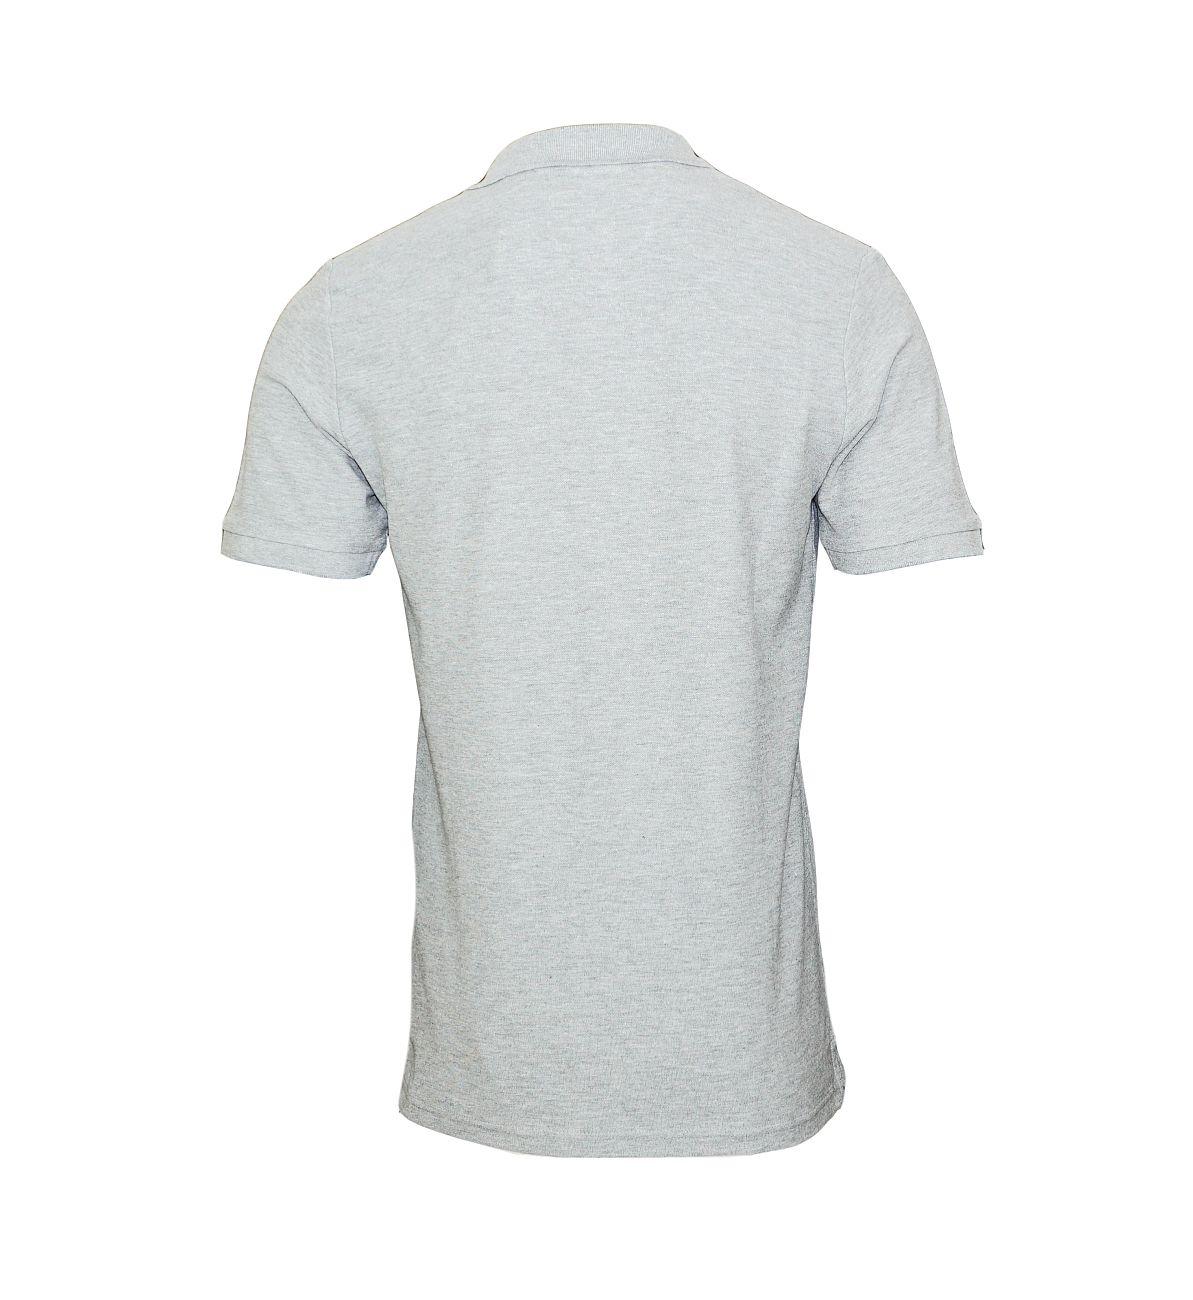 Daniel Hechter T-Shirt Poloshirt Polo 75101 181990 910 grau silver F18-DHP2